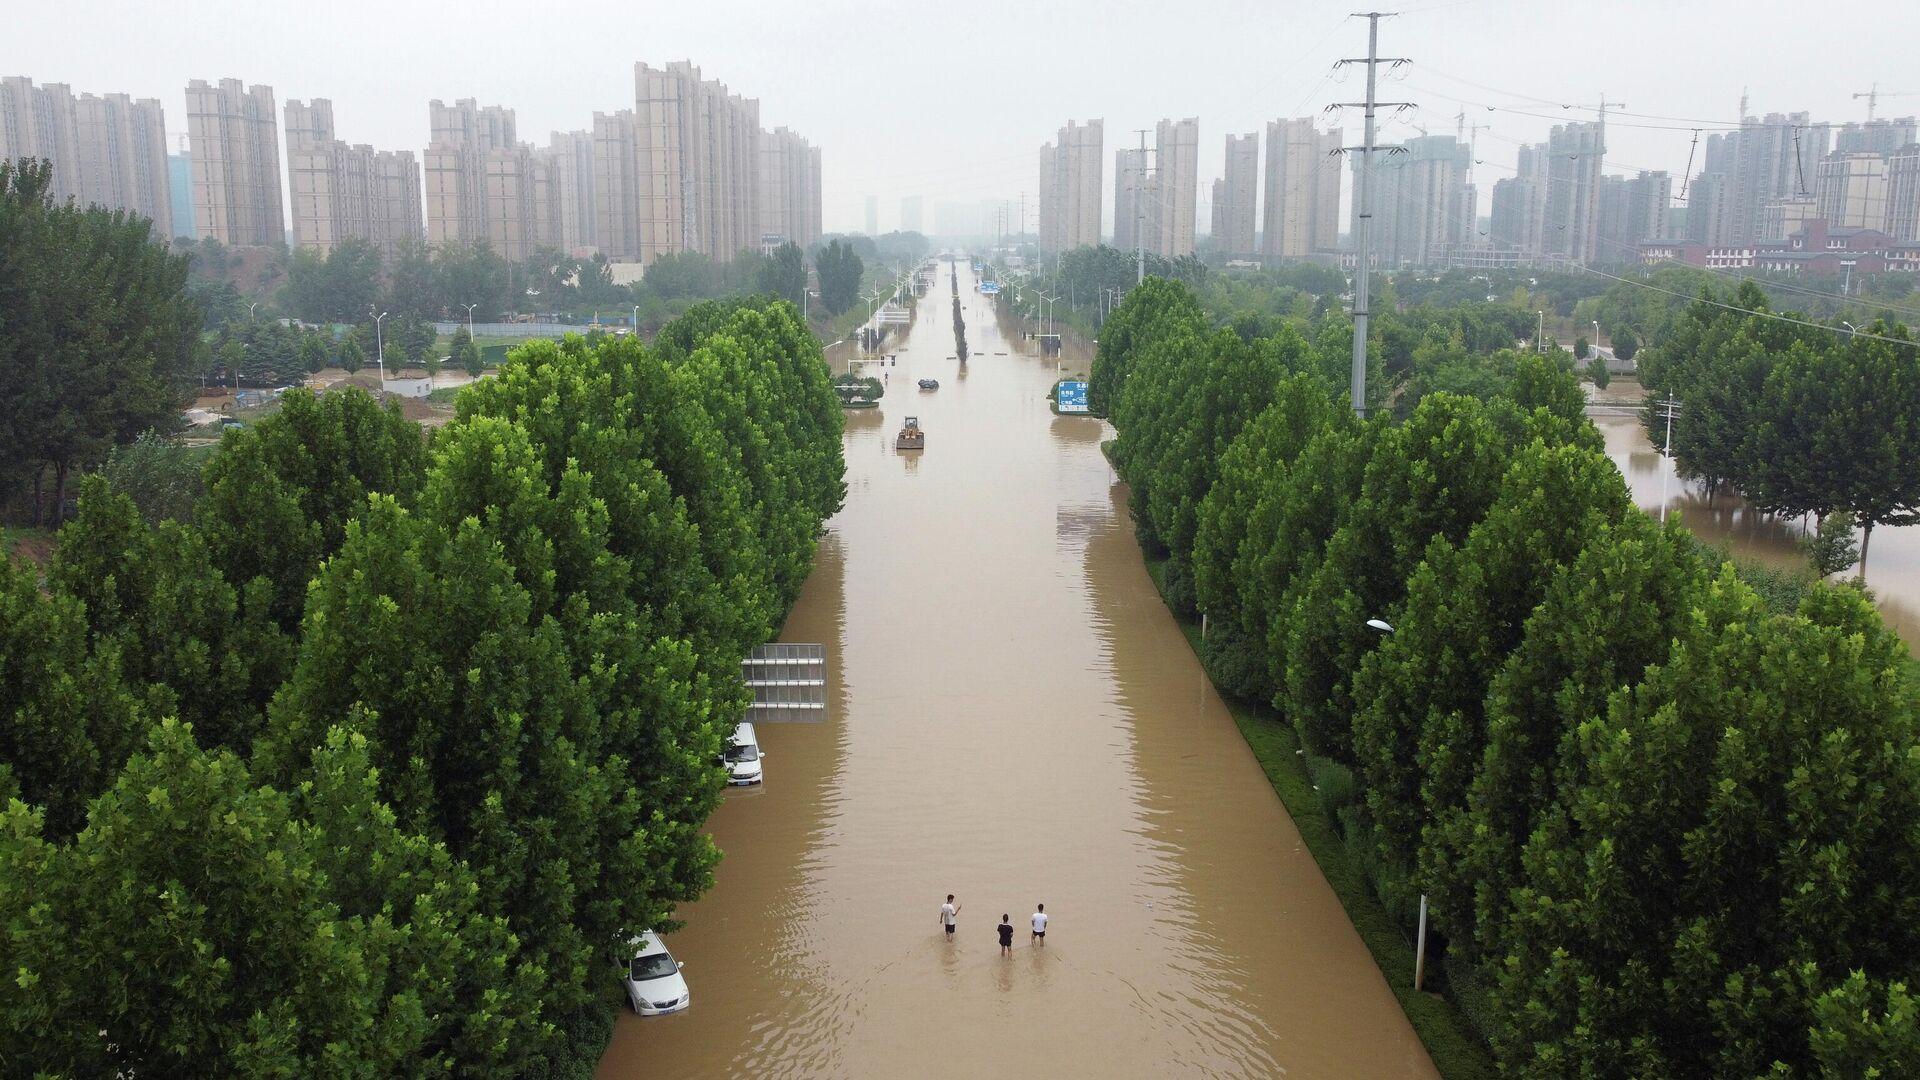 Inundaciones en China - Sputnik Mundo, 1920, 02.08.2021